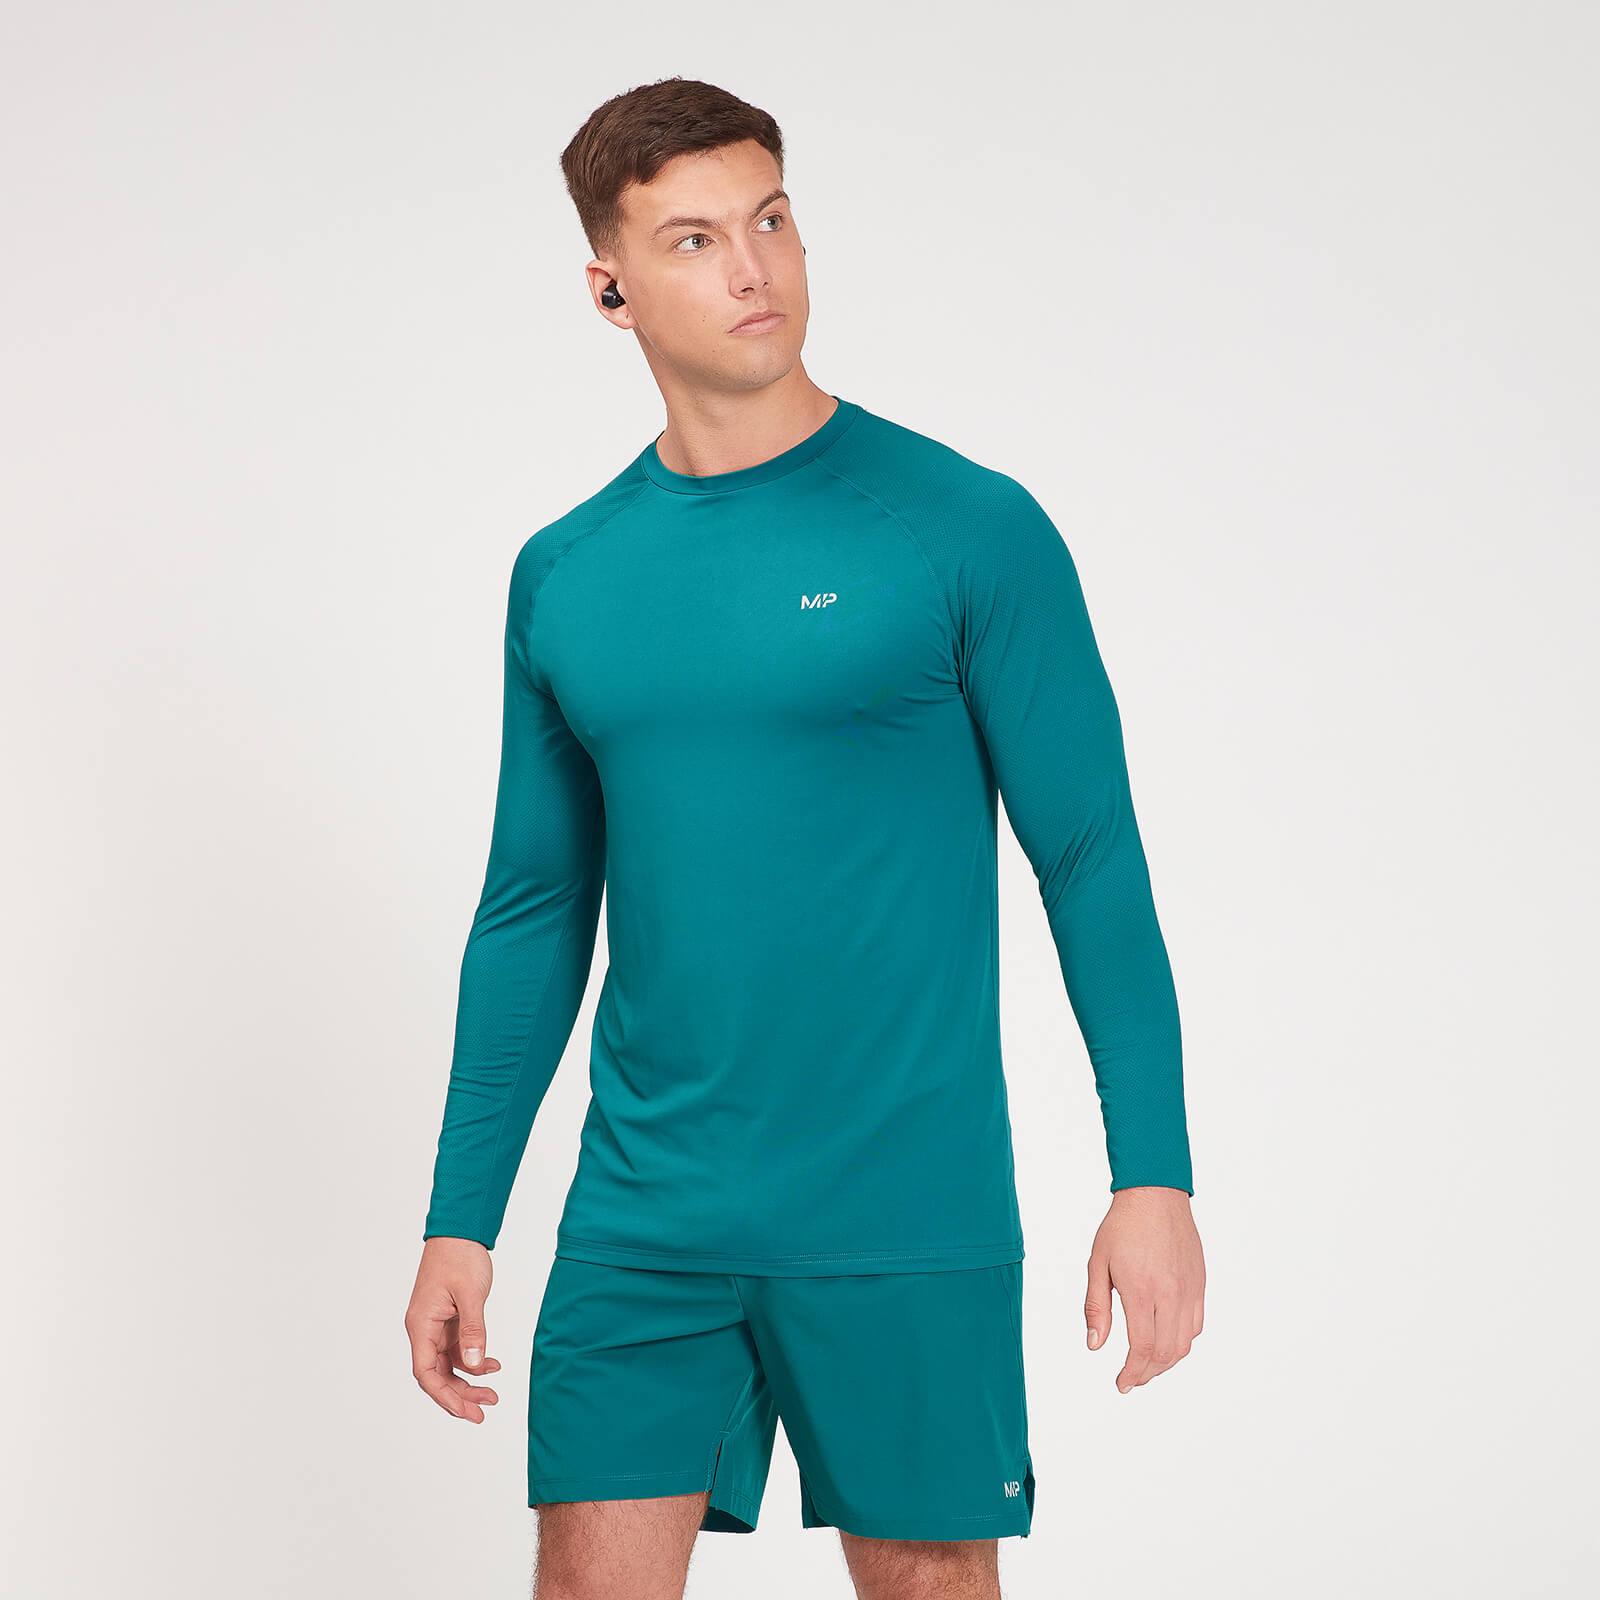 Купить MP Men's Velocity Long Sleeve Top - Teal - XXXL, Myprotein International